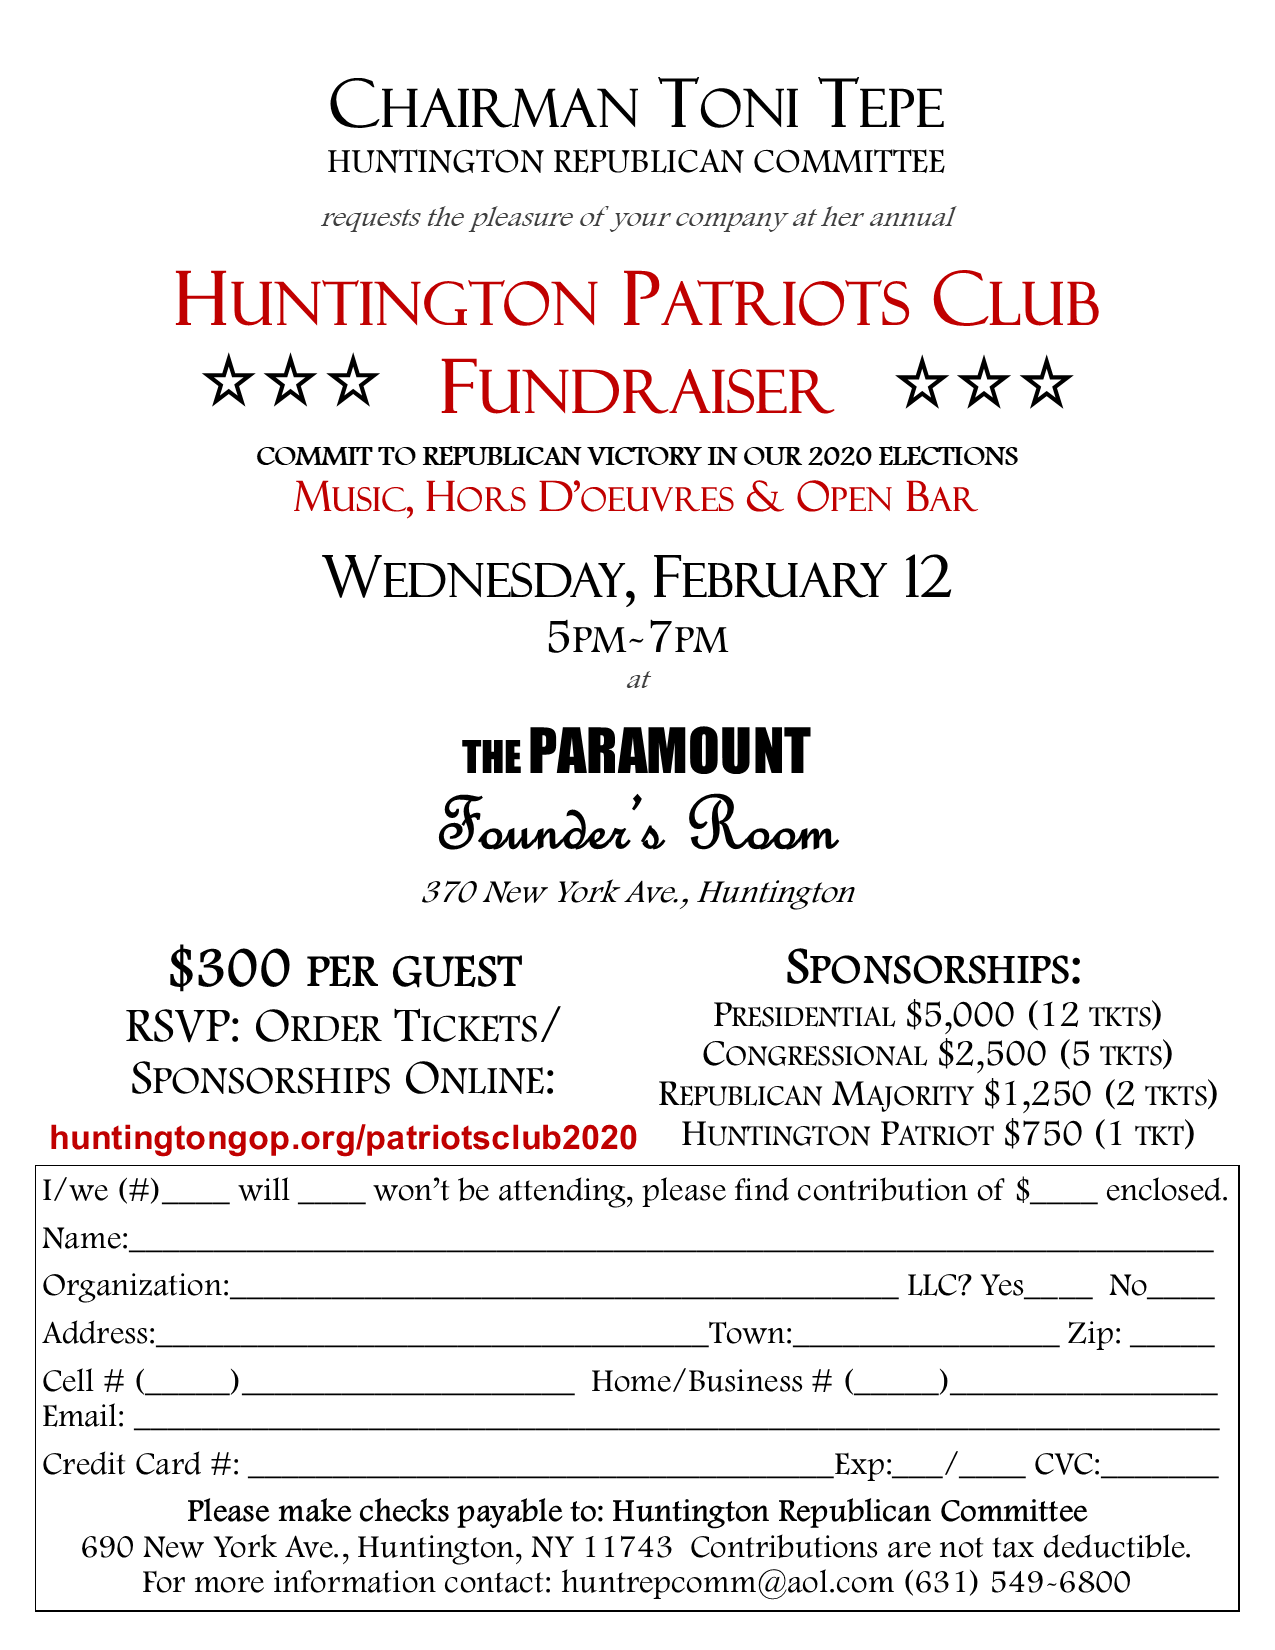 2020_Huntington_Patriots_Club_Fundraiser_Invite1.png